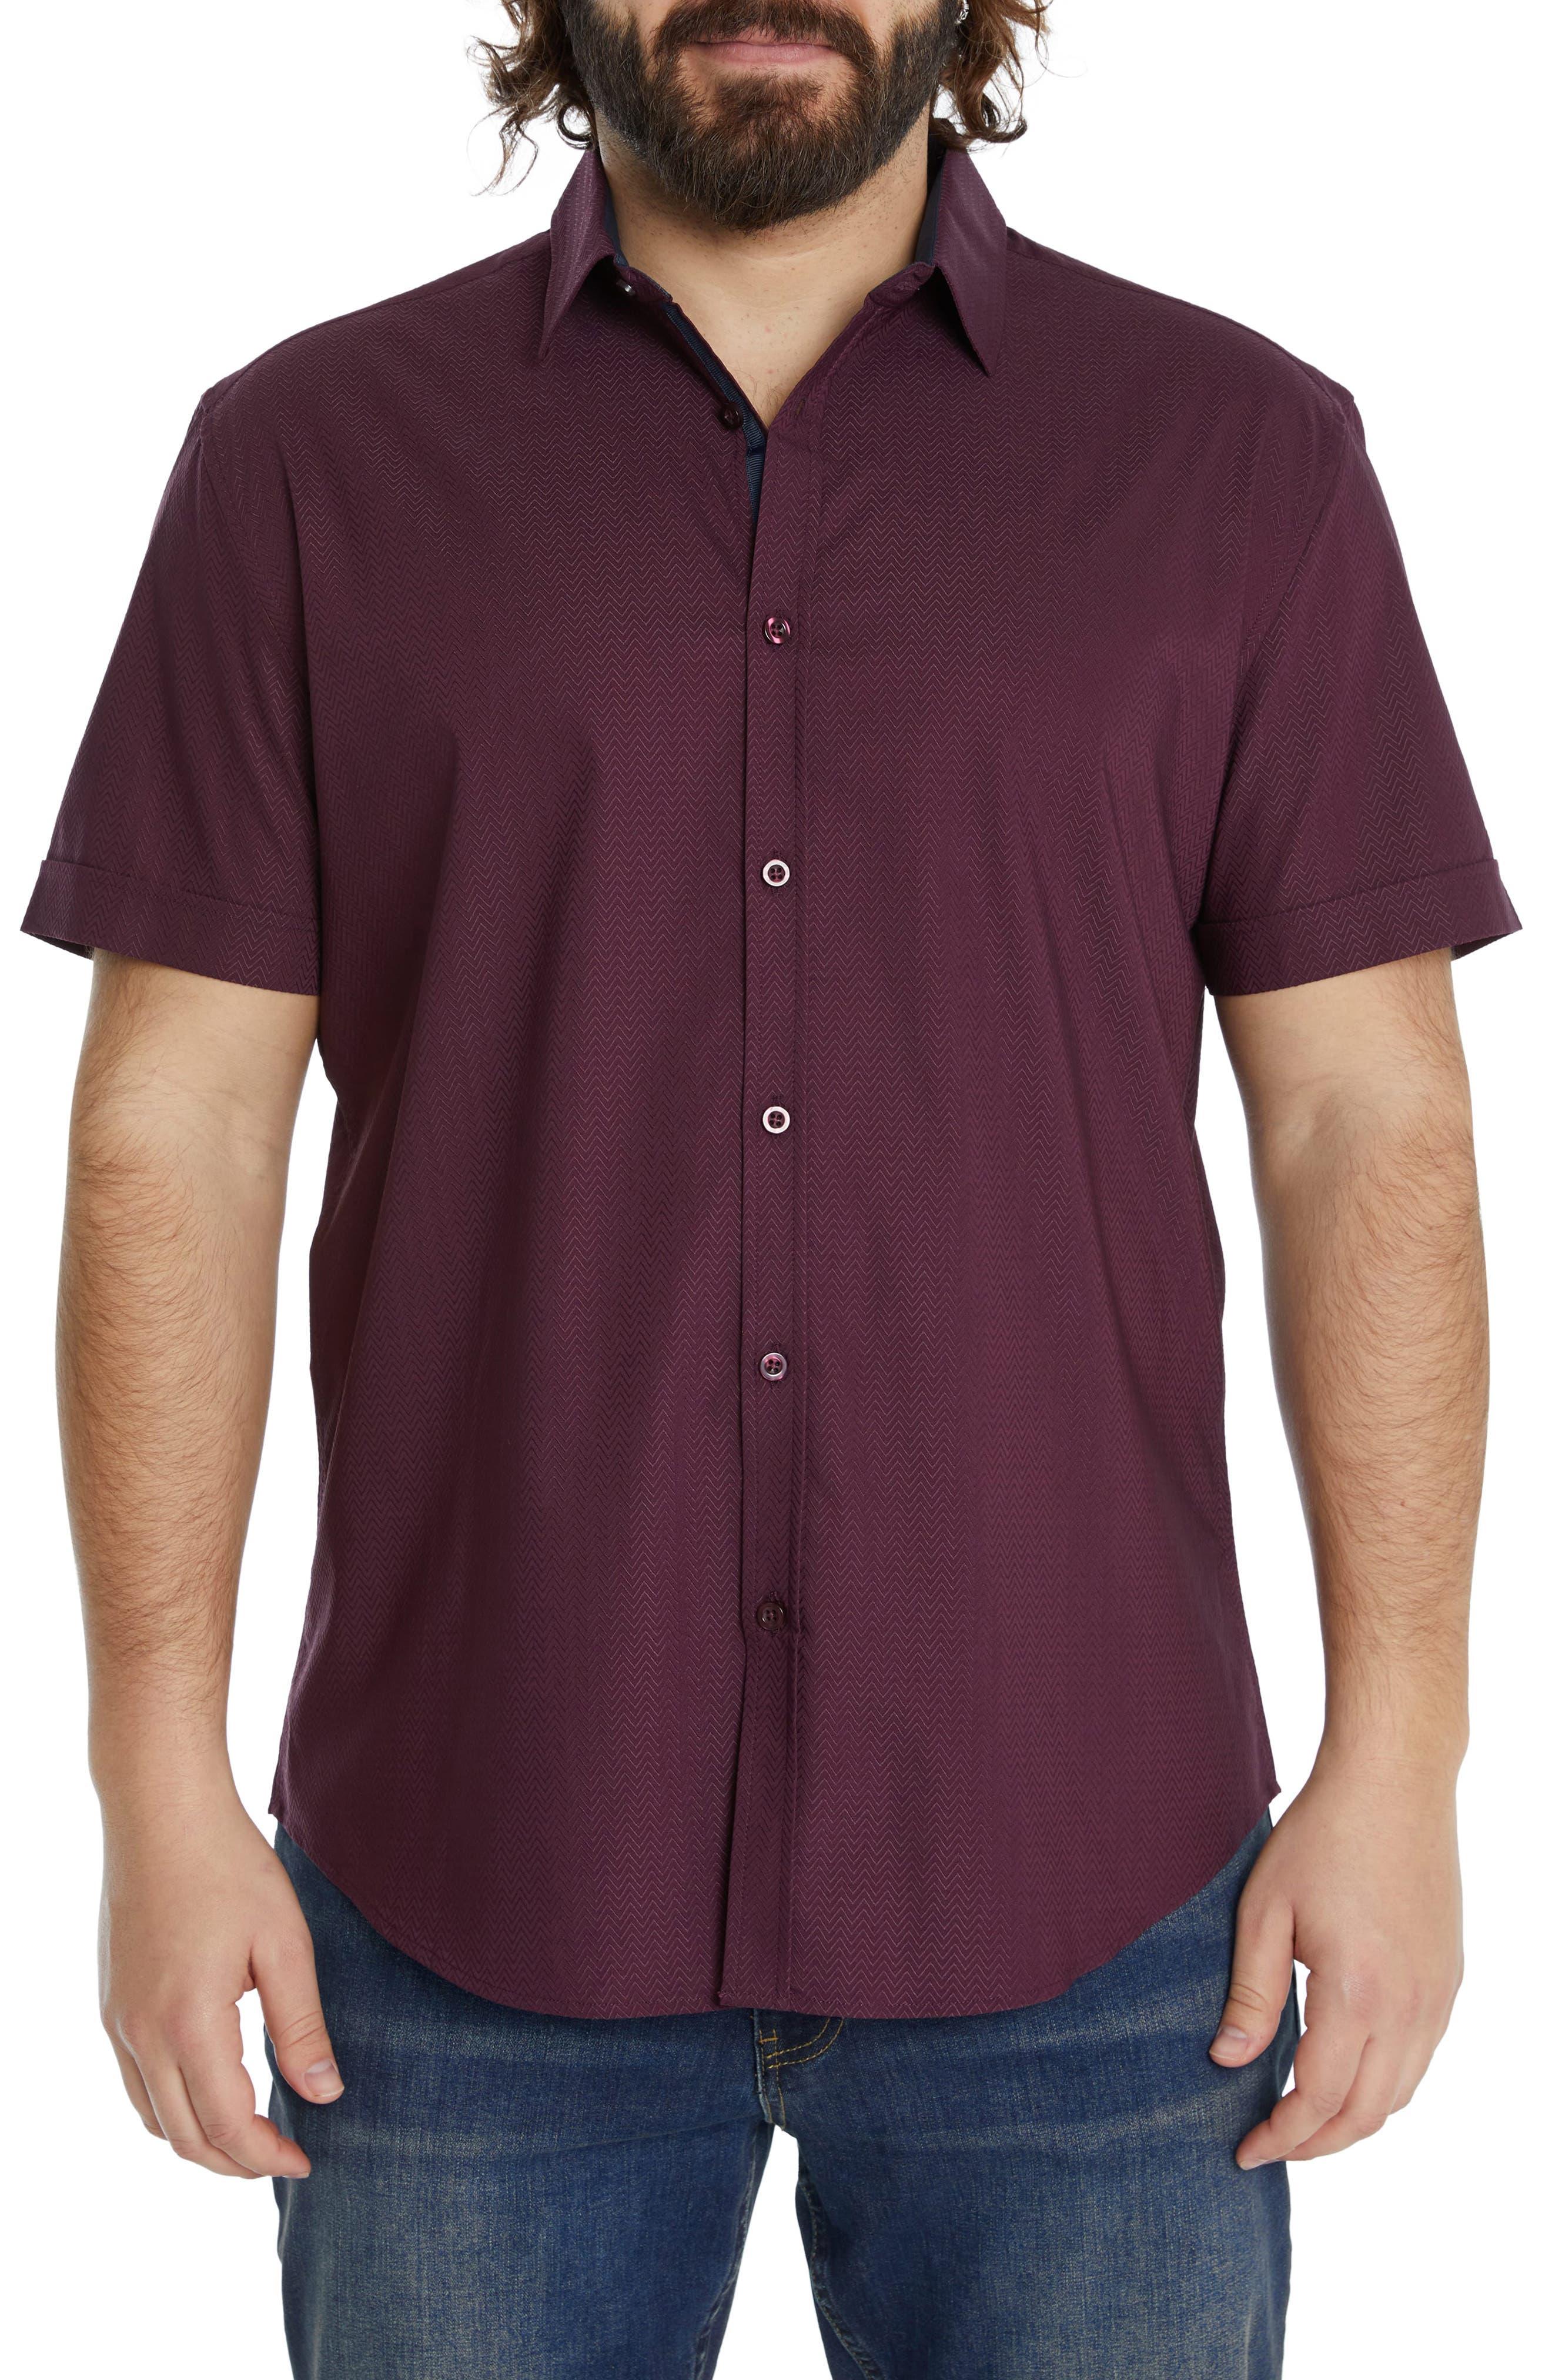 Emile Stretch Short Sleeve Button-Up Shirt